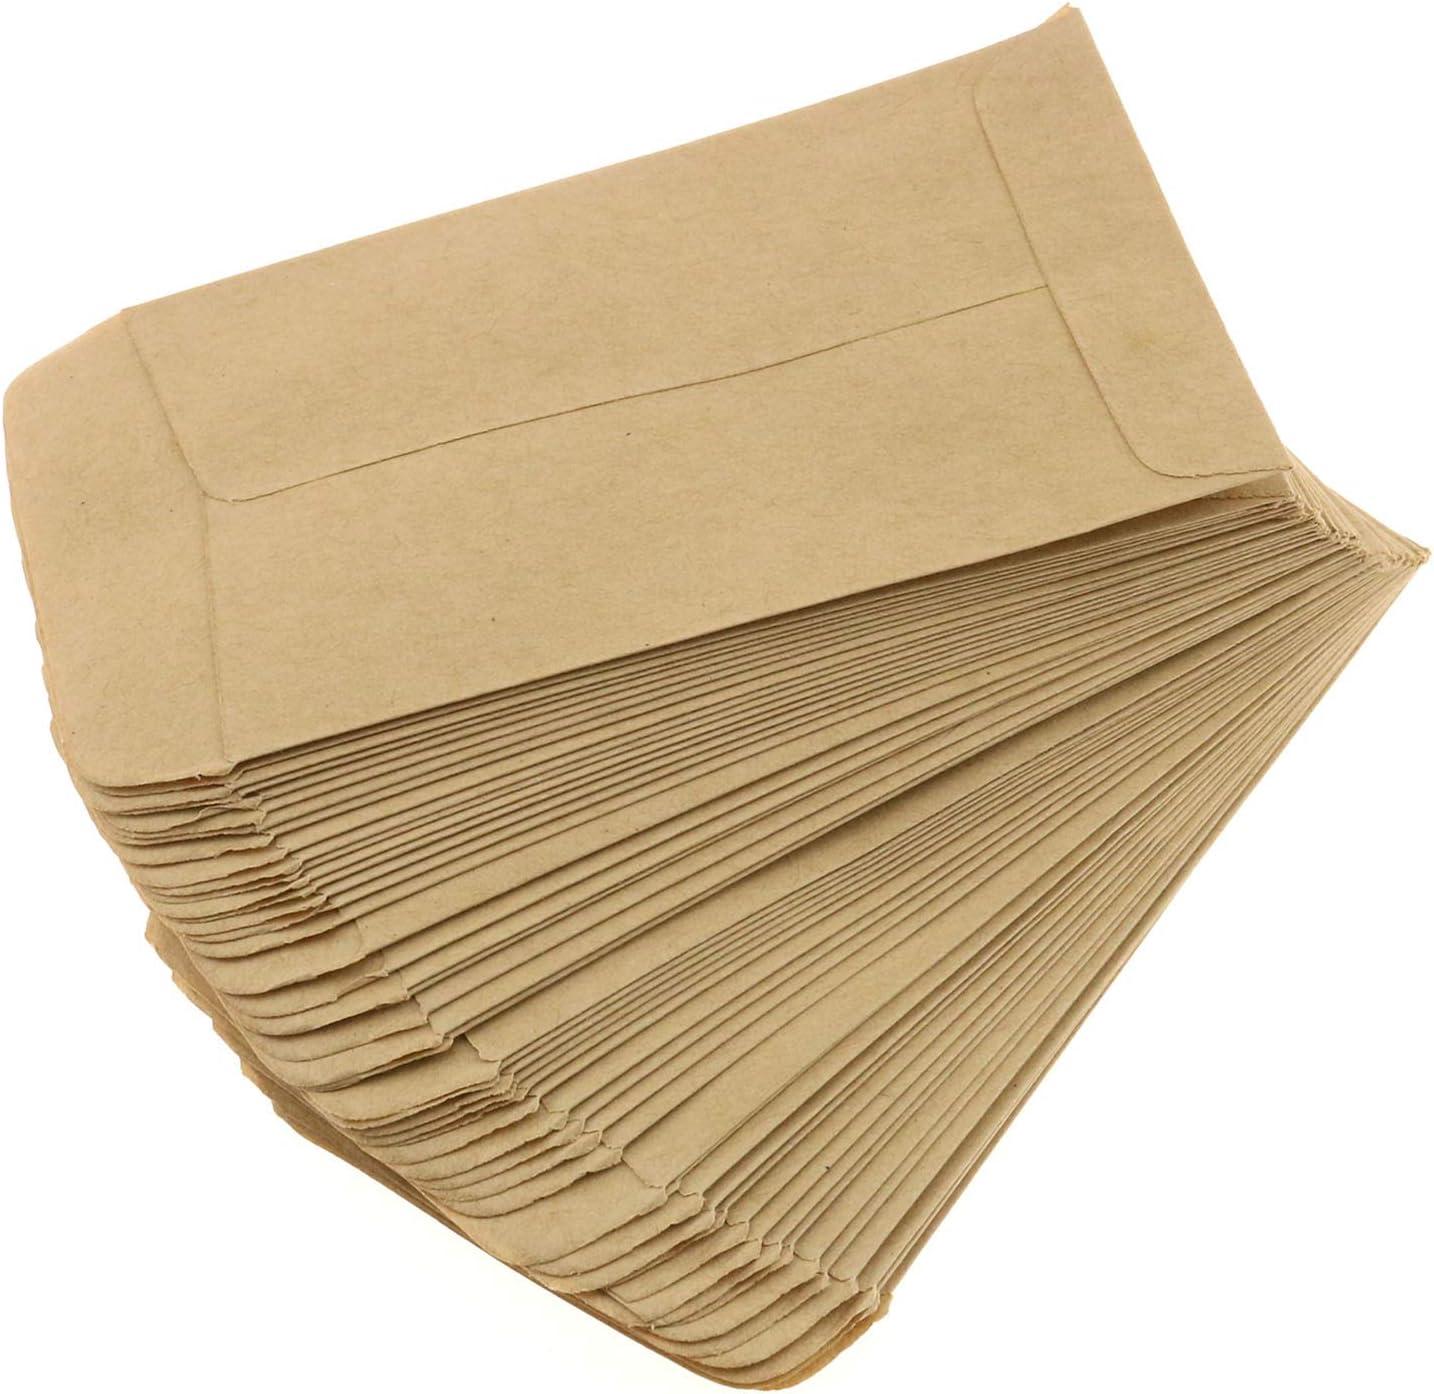 DGZZI Seed Superlatite Envelope 100 PCS Pap 2.36x4.33Inch Max 58% OFF Kraft Brown 6x10cm